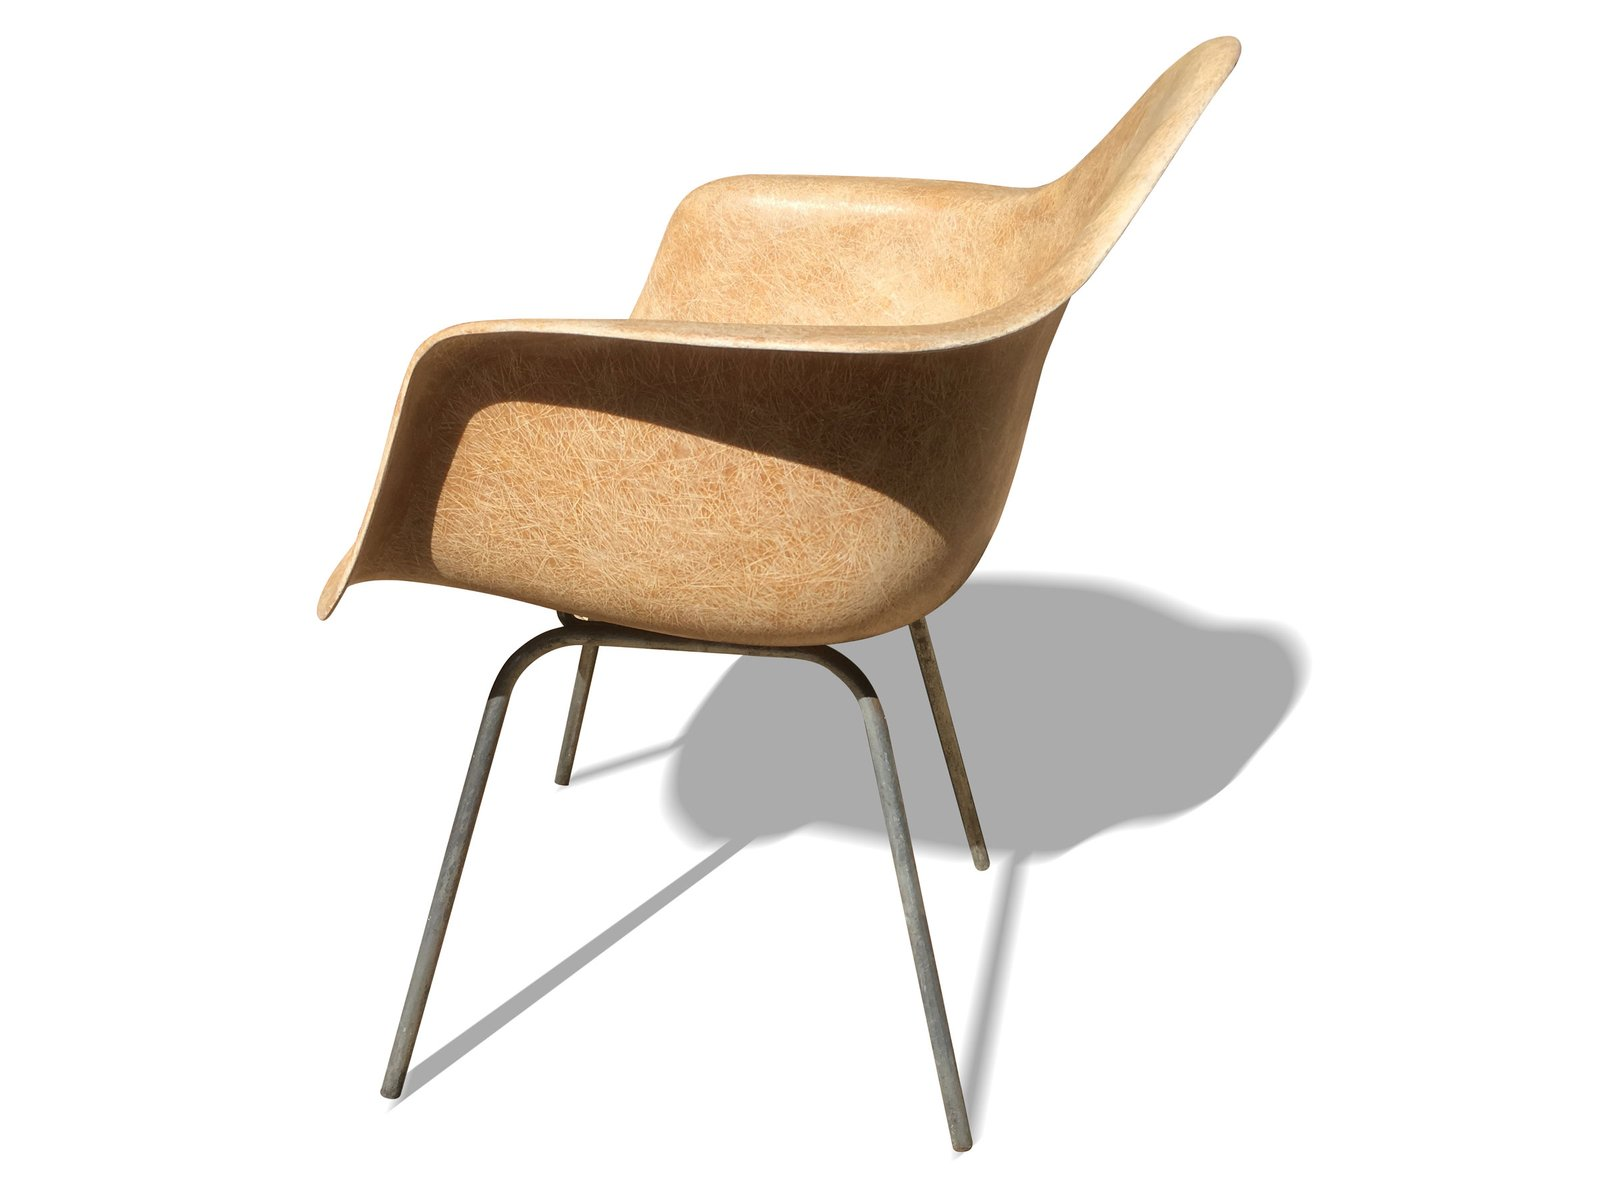 Chaise dax par charles ray eames pour zenith plastics for Vente chaise eames